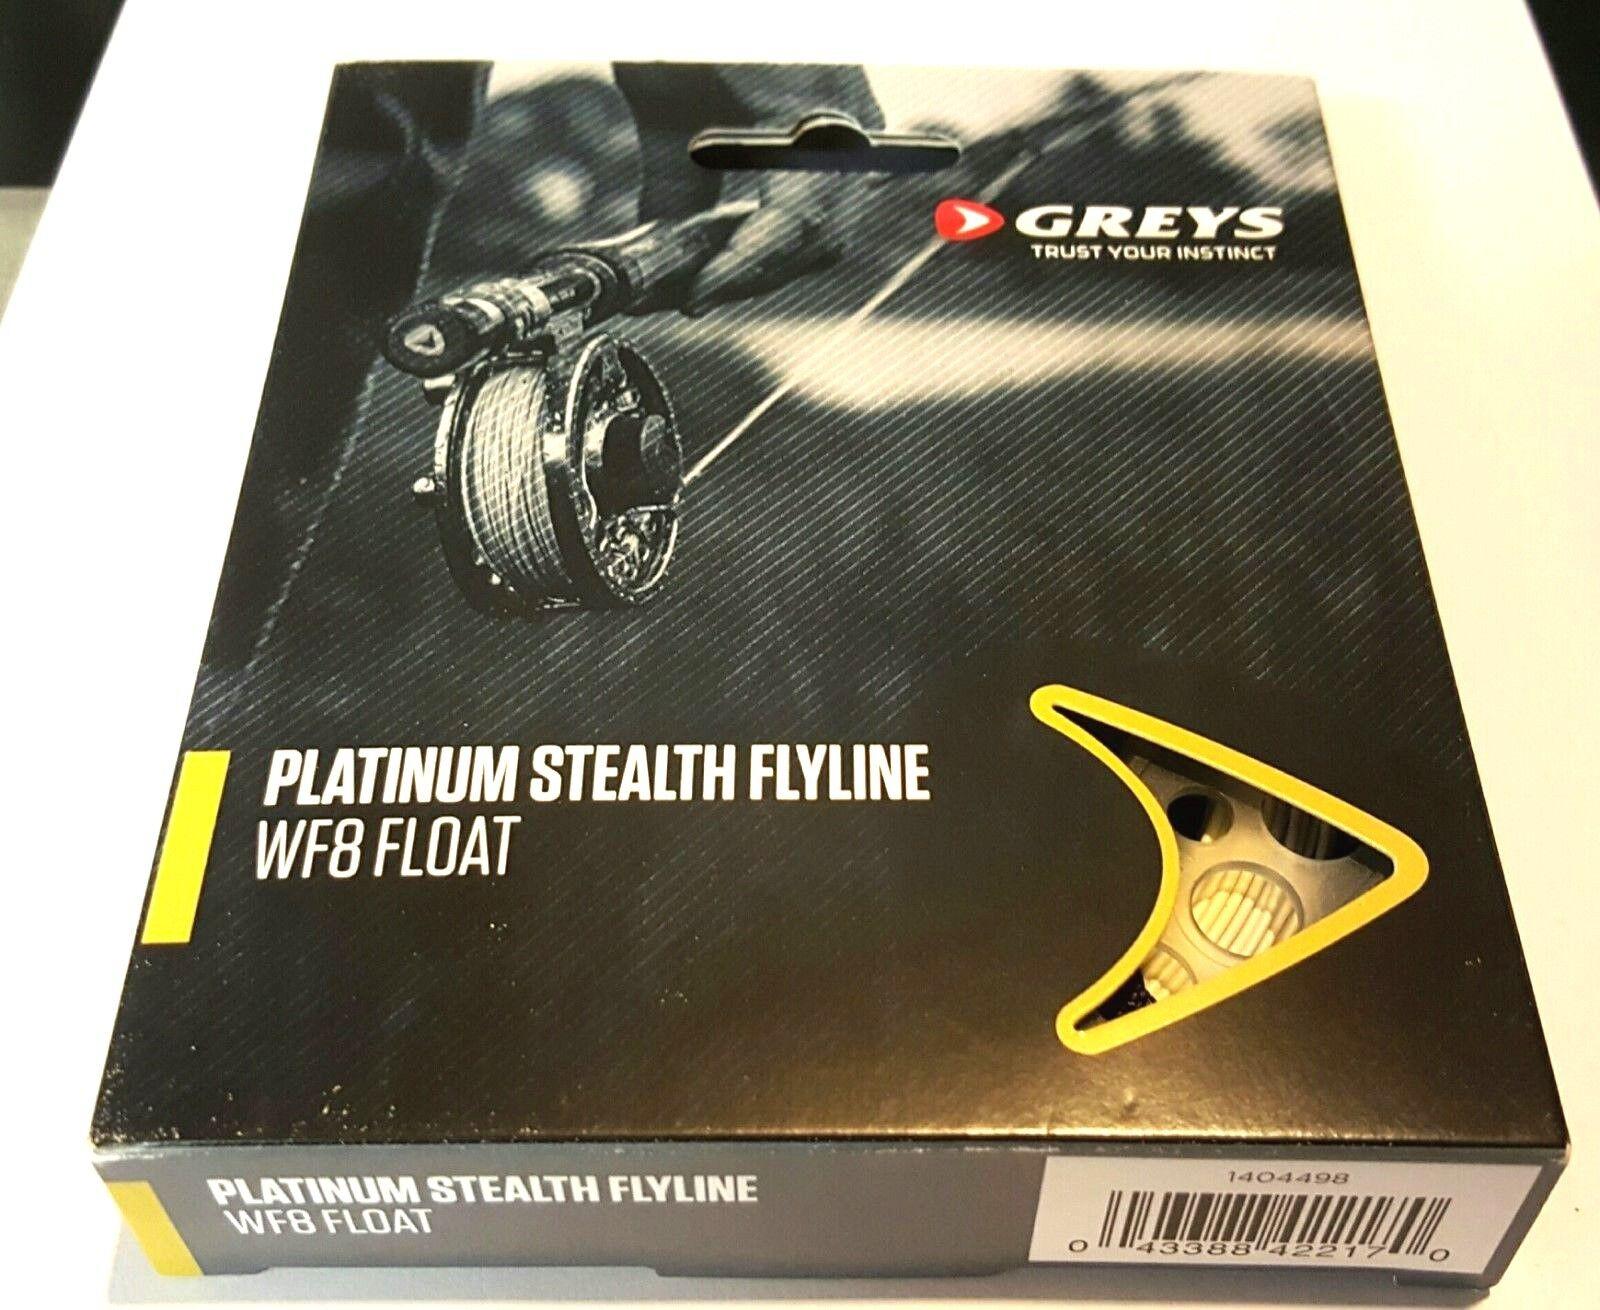 grigios Platino Fly GtuttiEGGIANTE Stealth linee